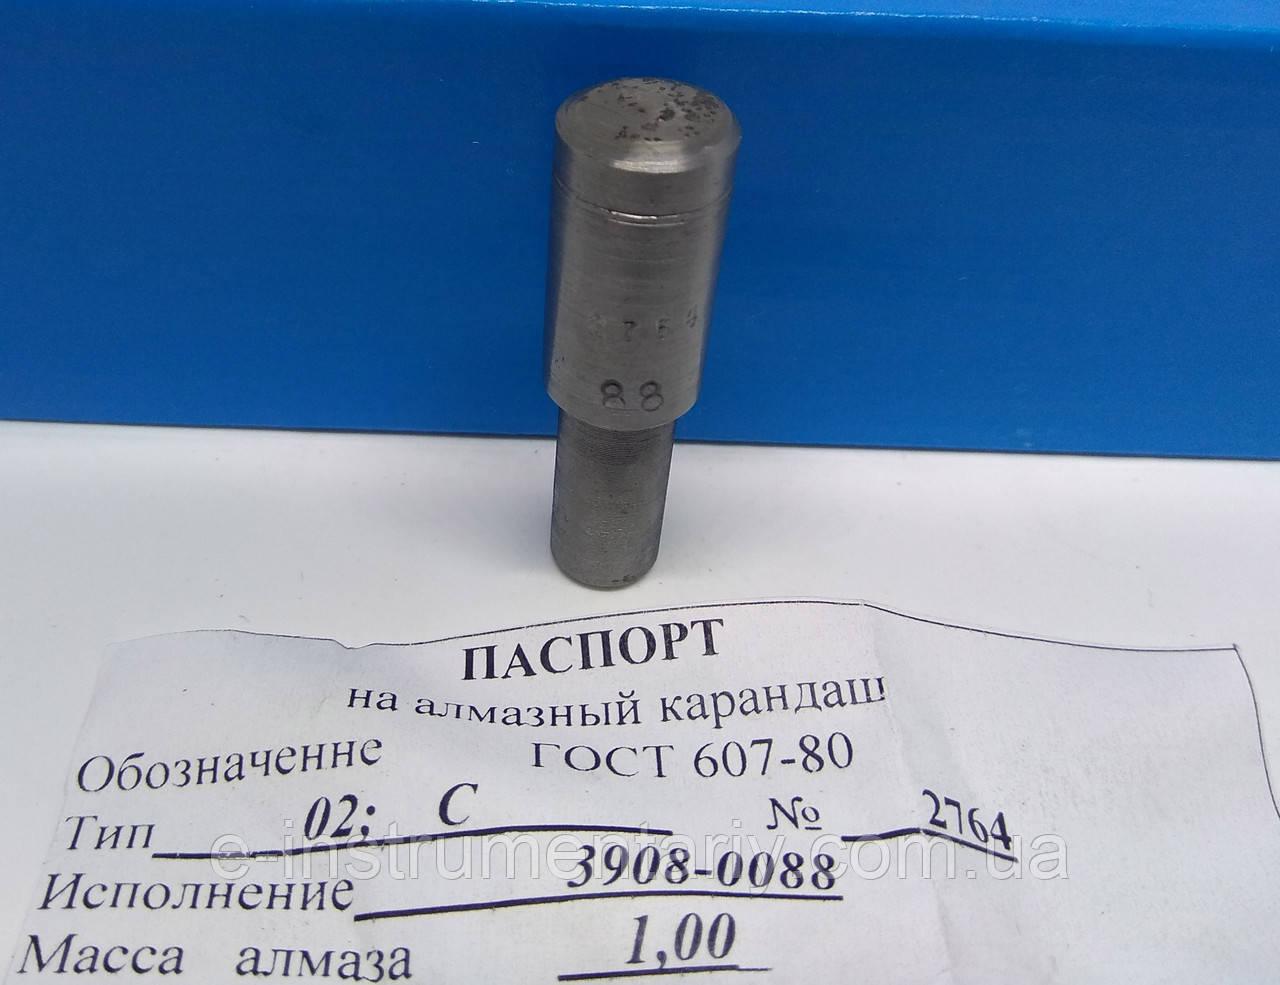 Карандаш алмазный 3908-0088/1 тип 02 исп.С 1,0 карат. качество- 1